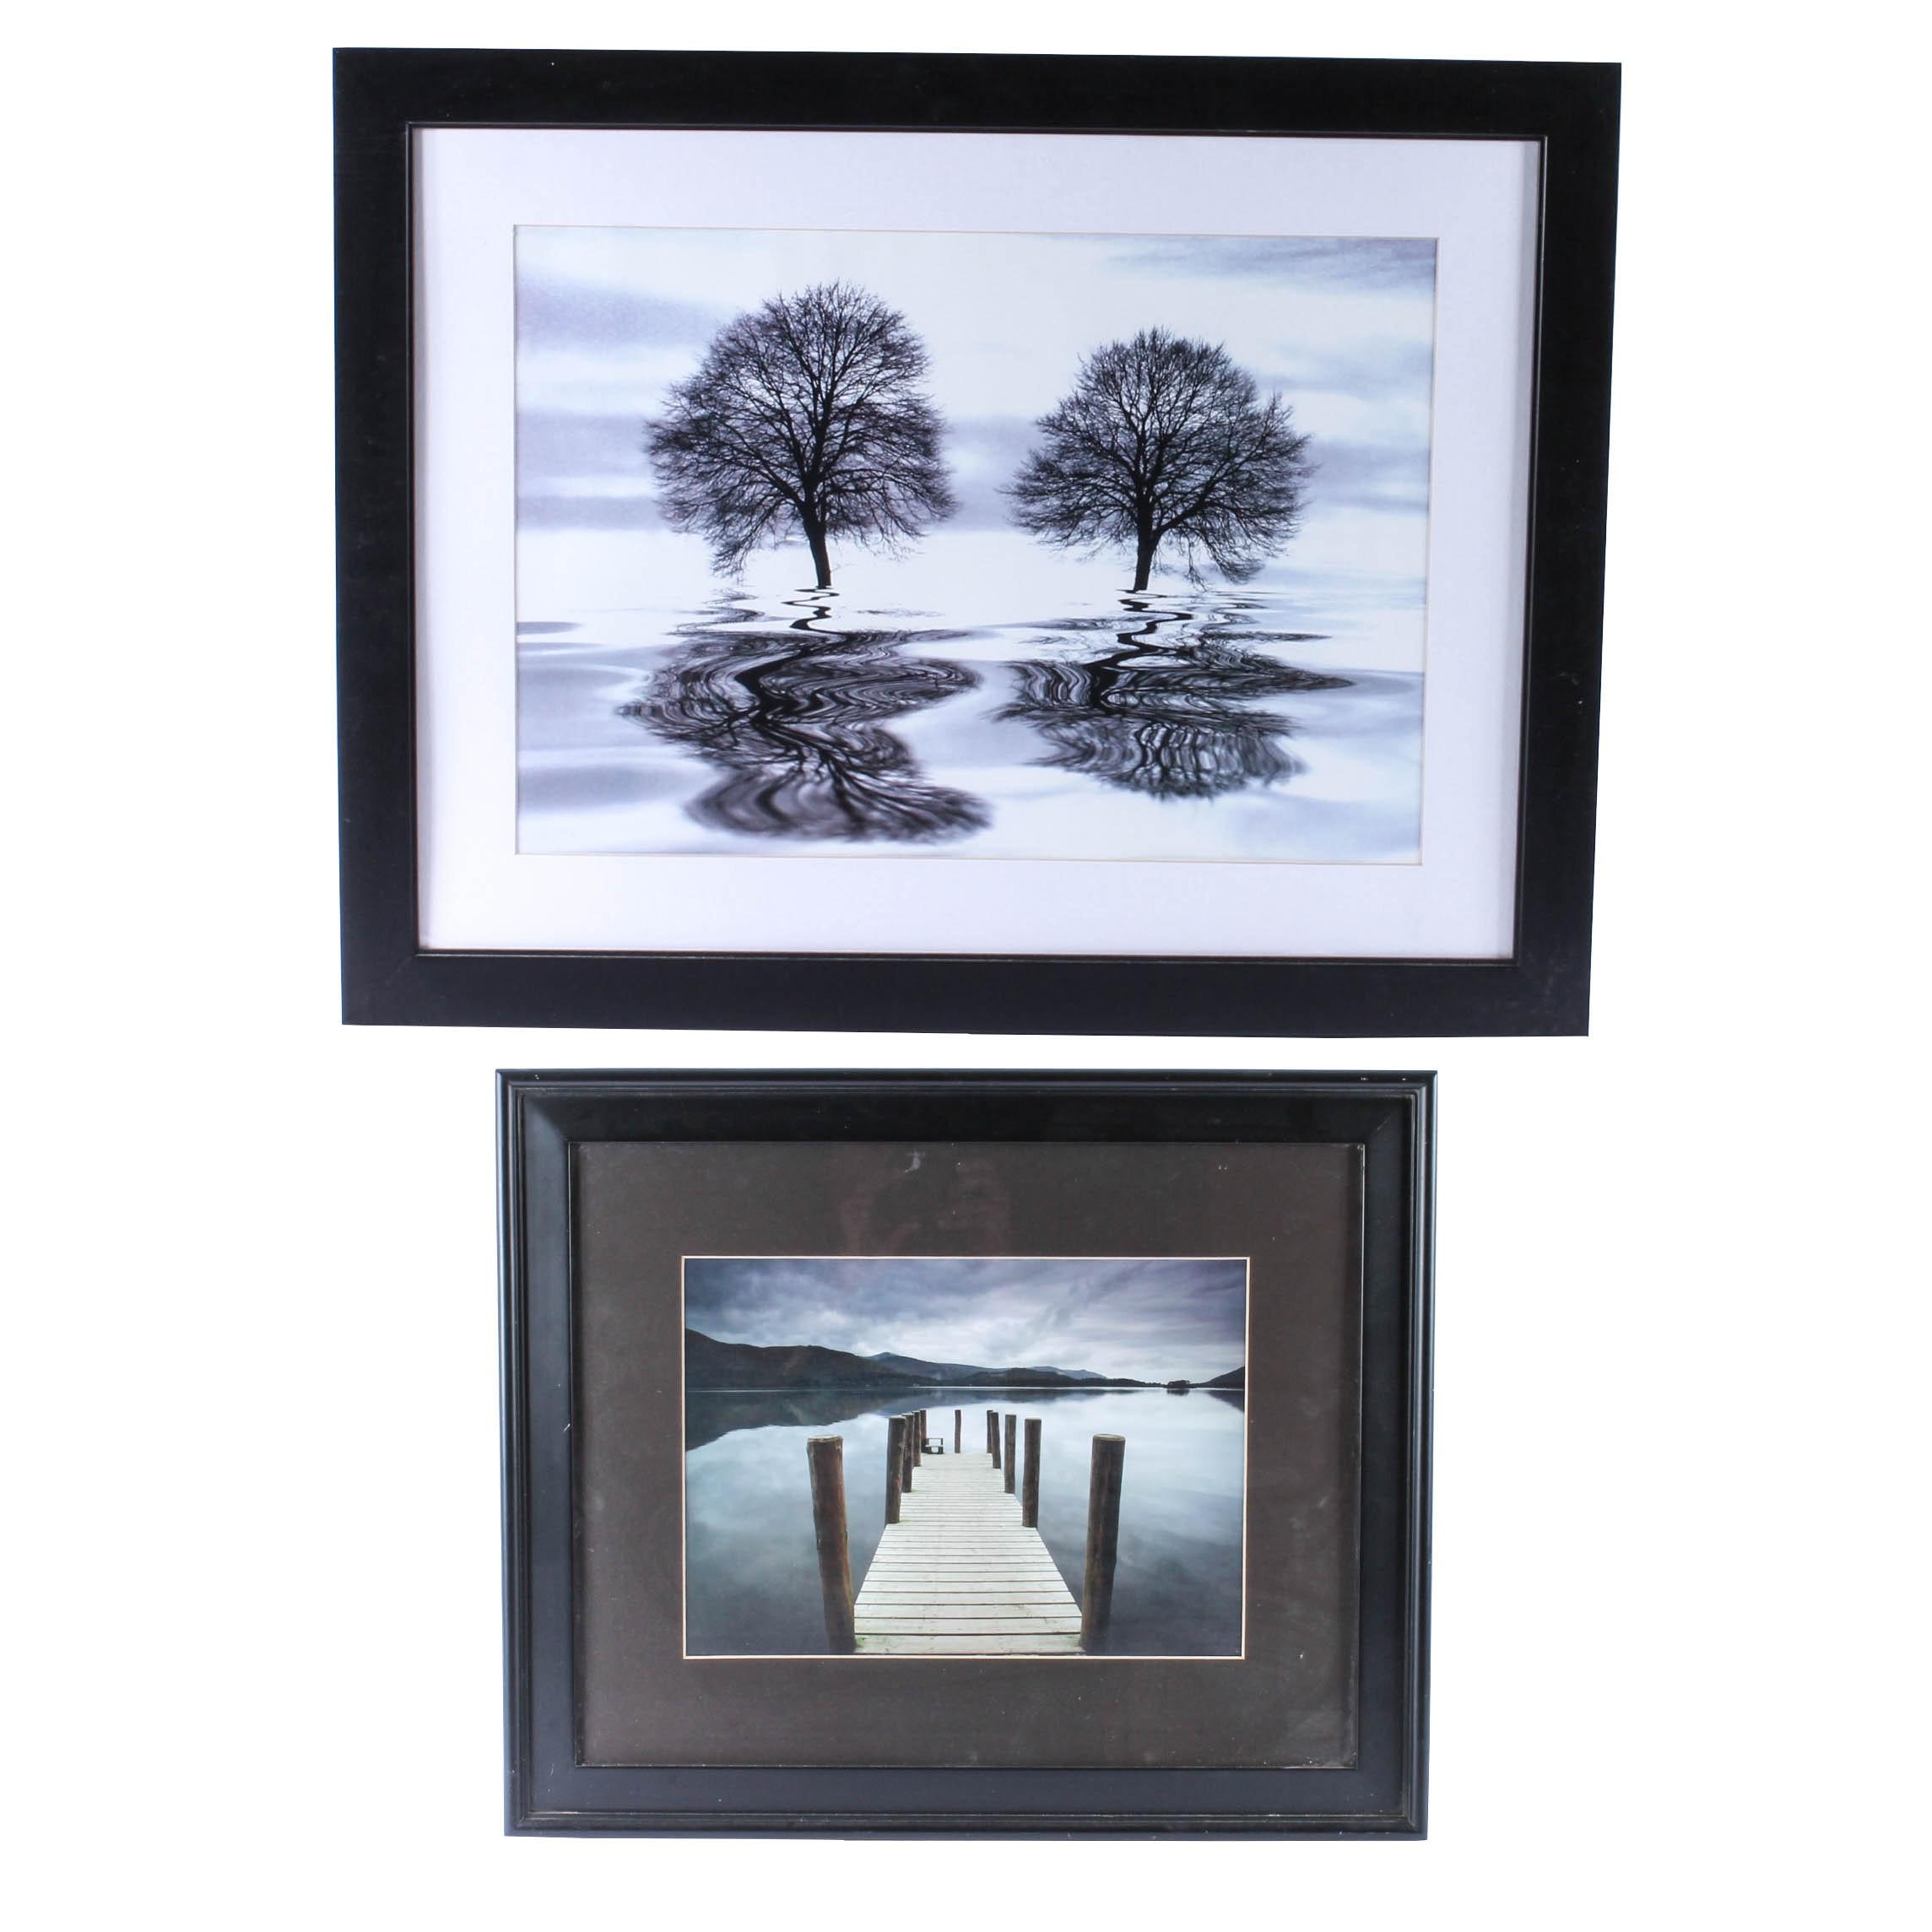 Two Framed Photographic Landscape Prints